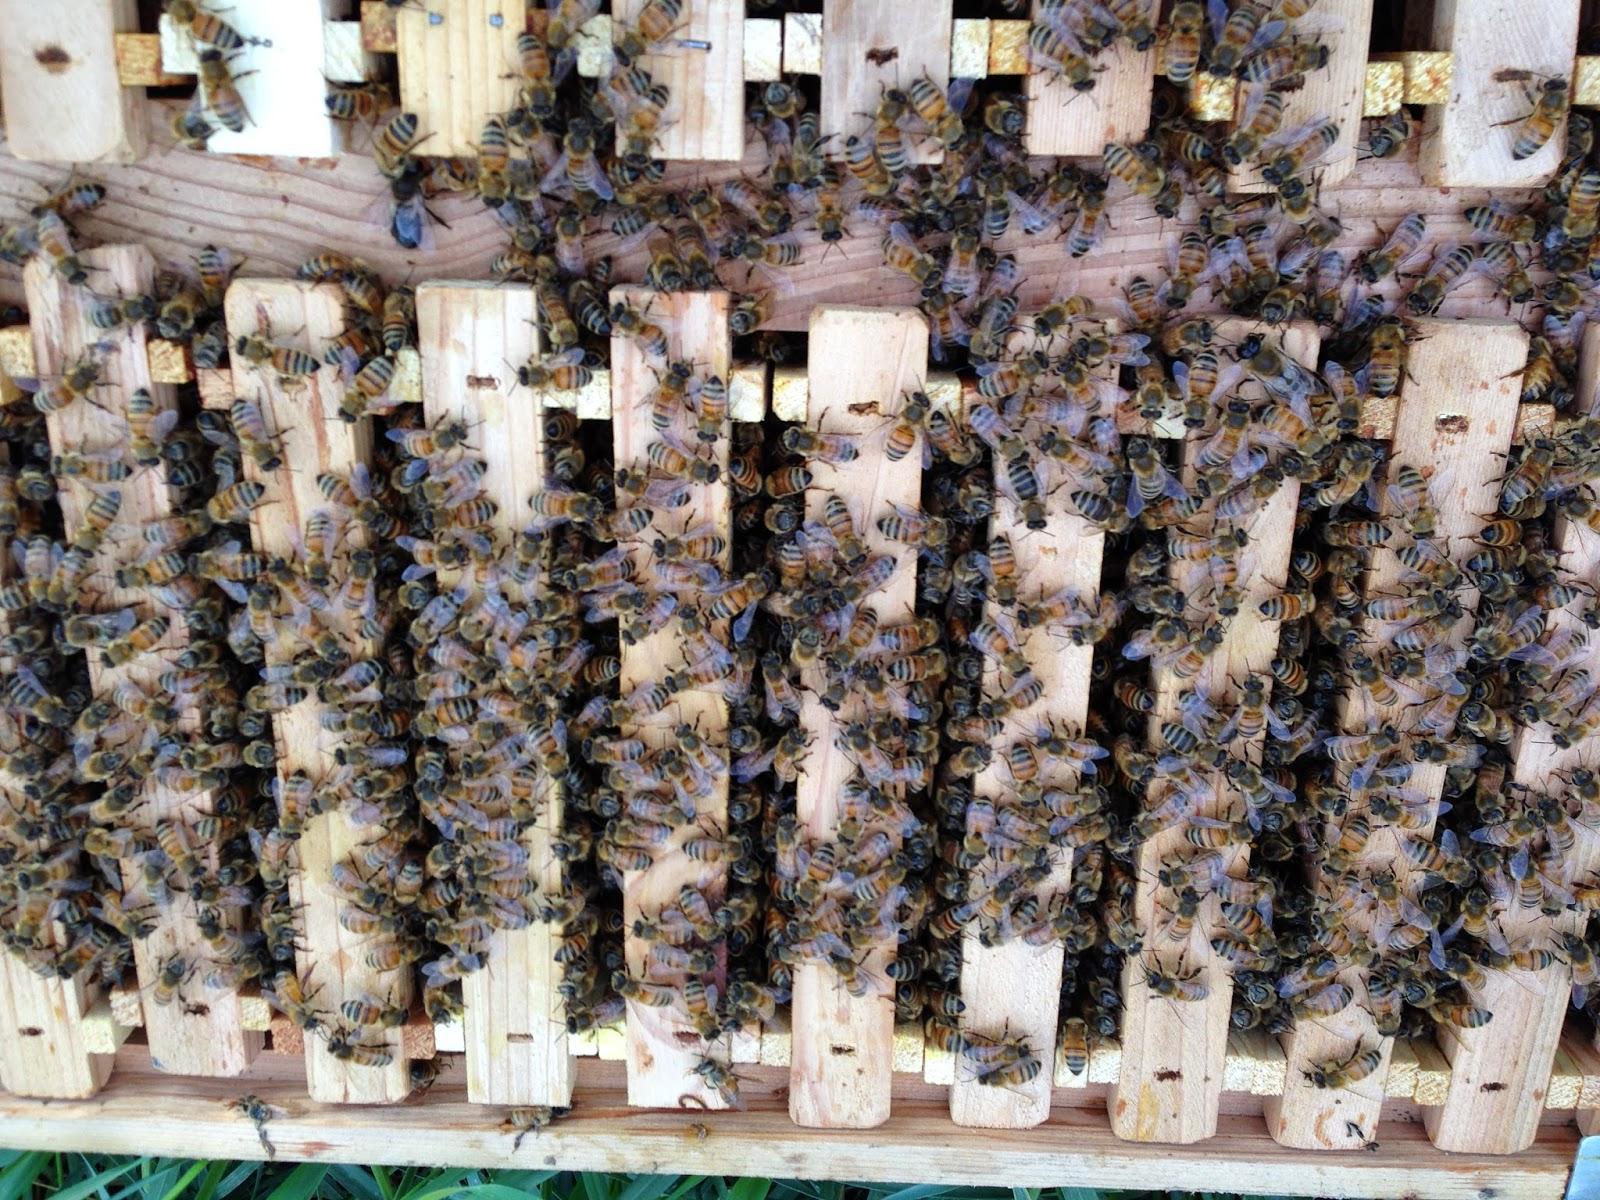 JoyFan Harvest Bee Hive Harvest Bee Hive pollination Beekeeping King Box for Queen Breeding Tool Beekeeping Equipment